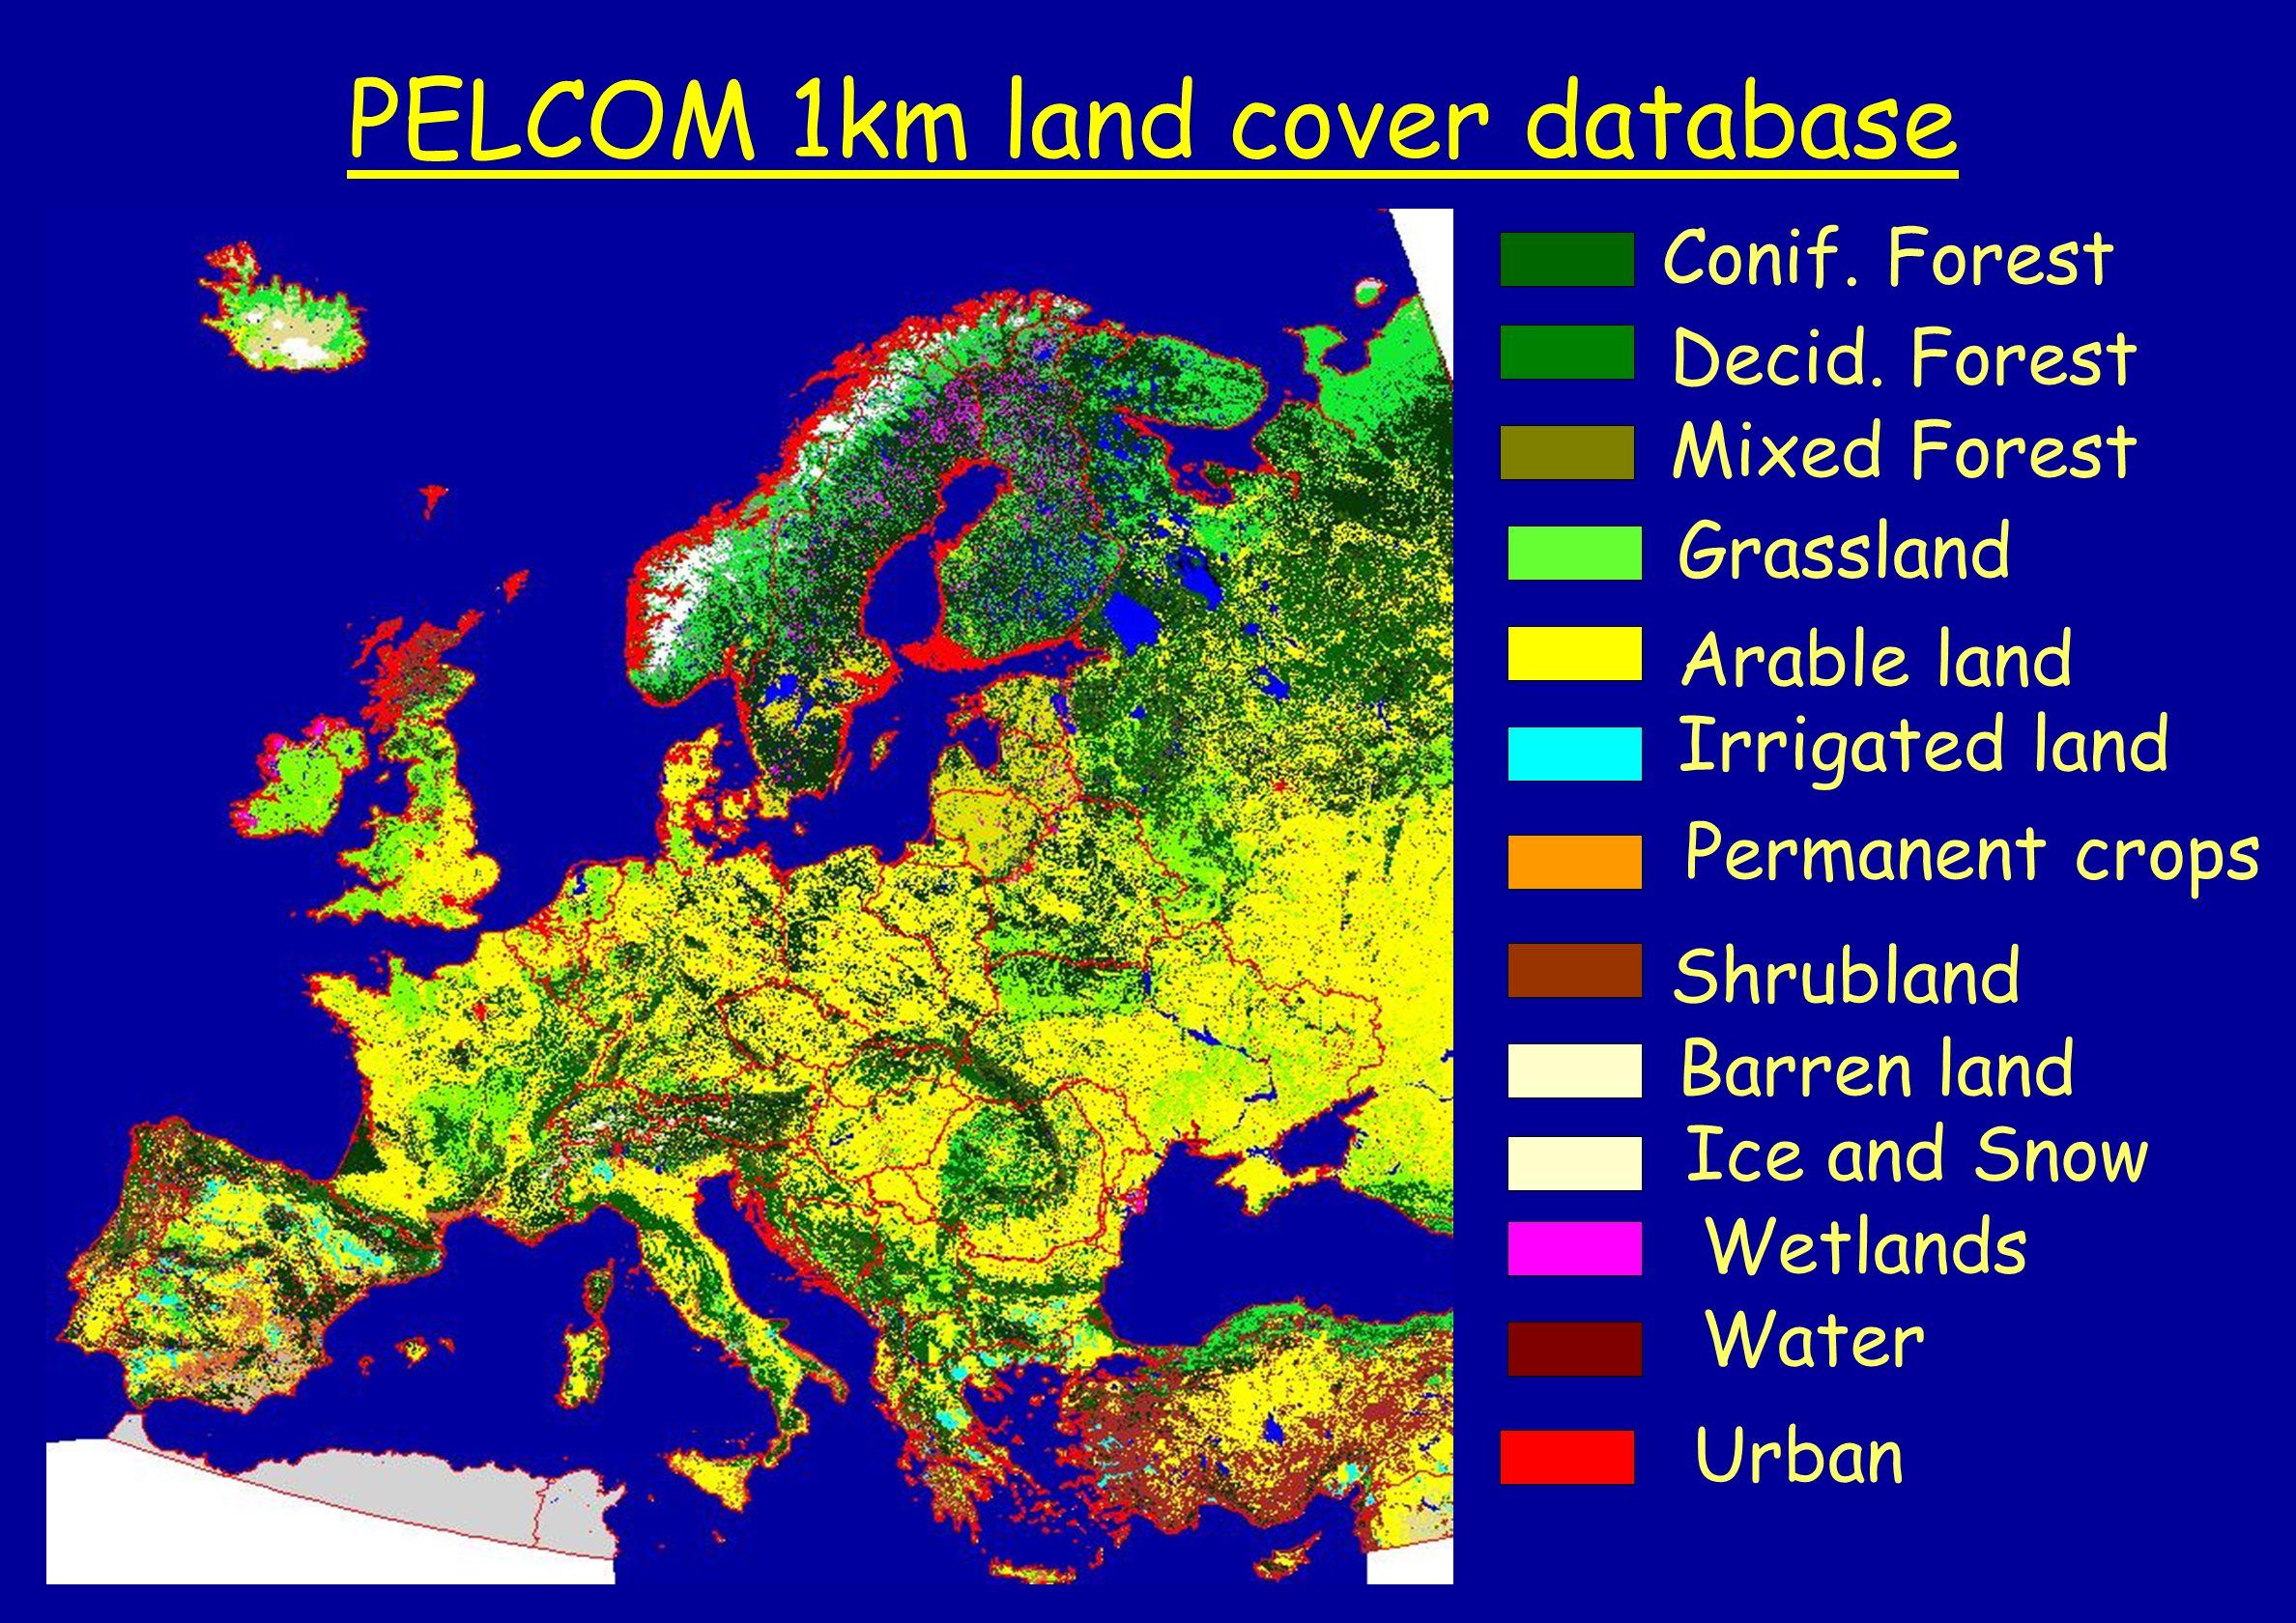 PELCOM 1km land cover database